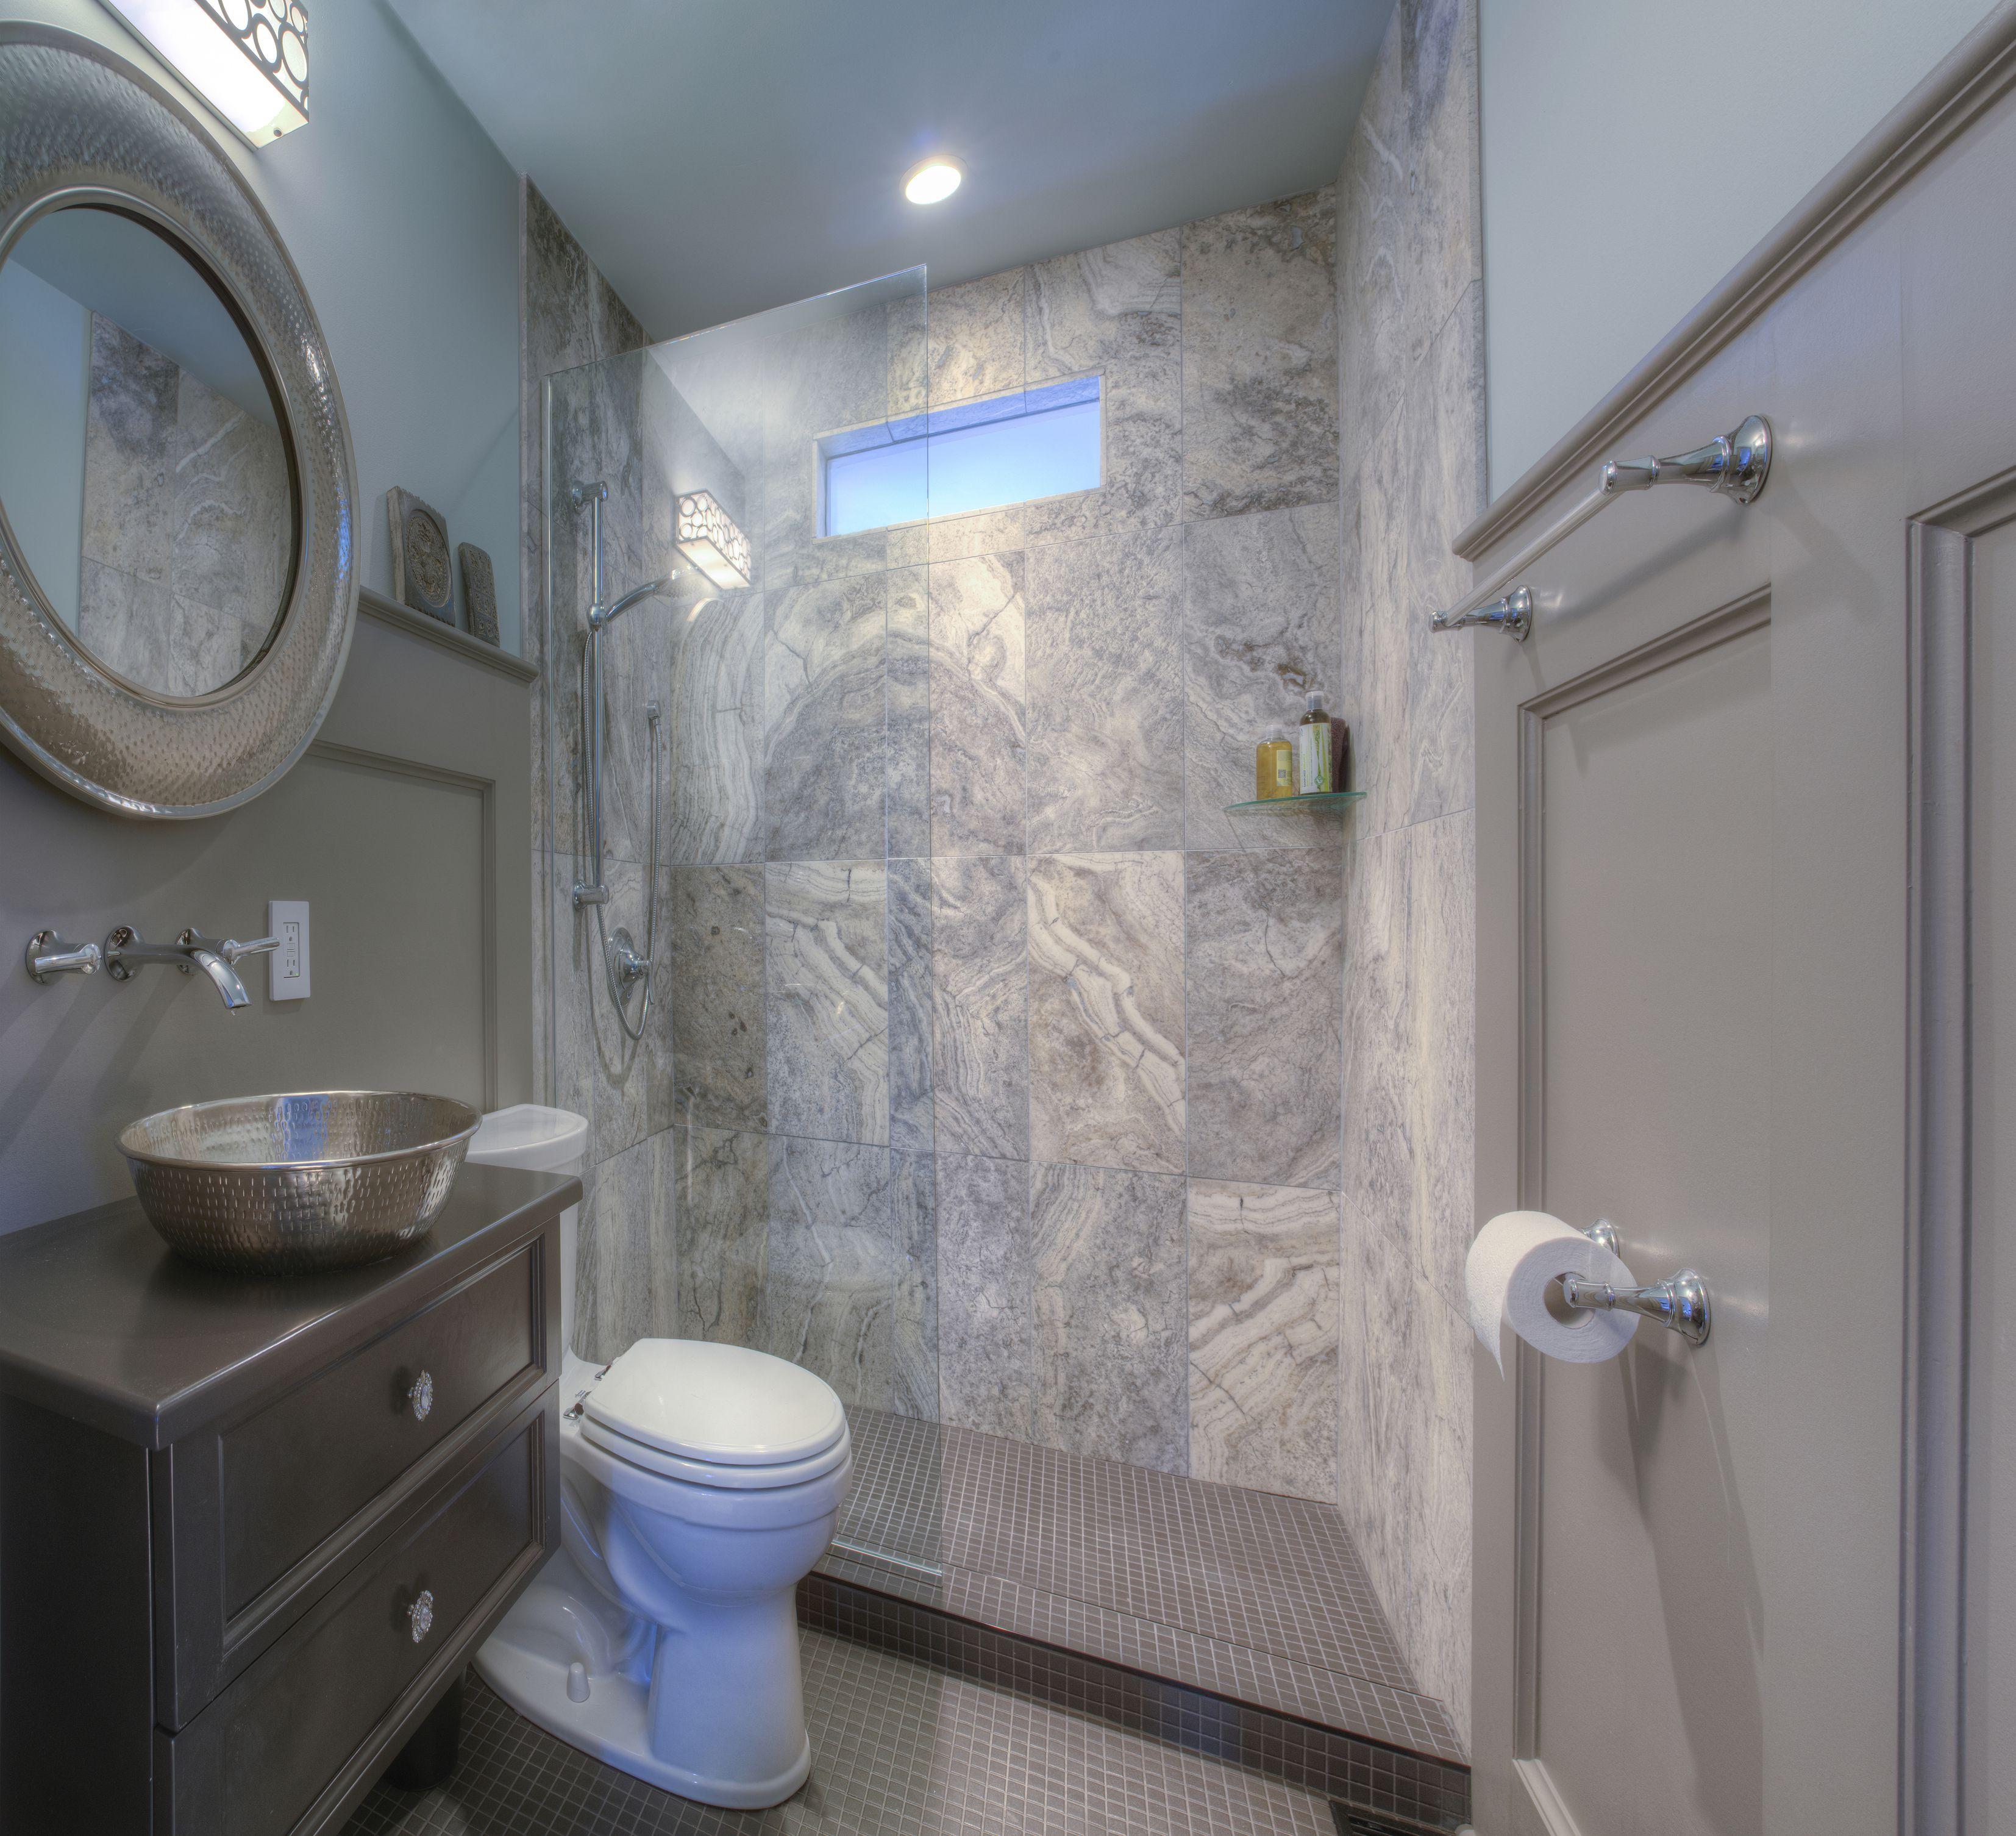 25 Professional Small Bathroom Design Tips on Small Bathroom Ideas Photo Gallery id=44727